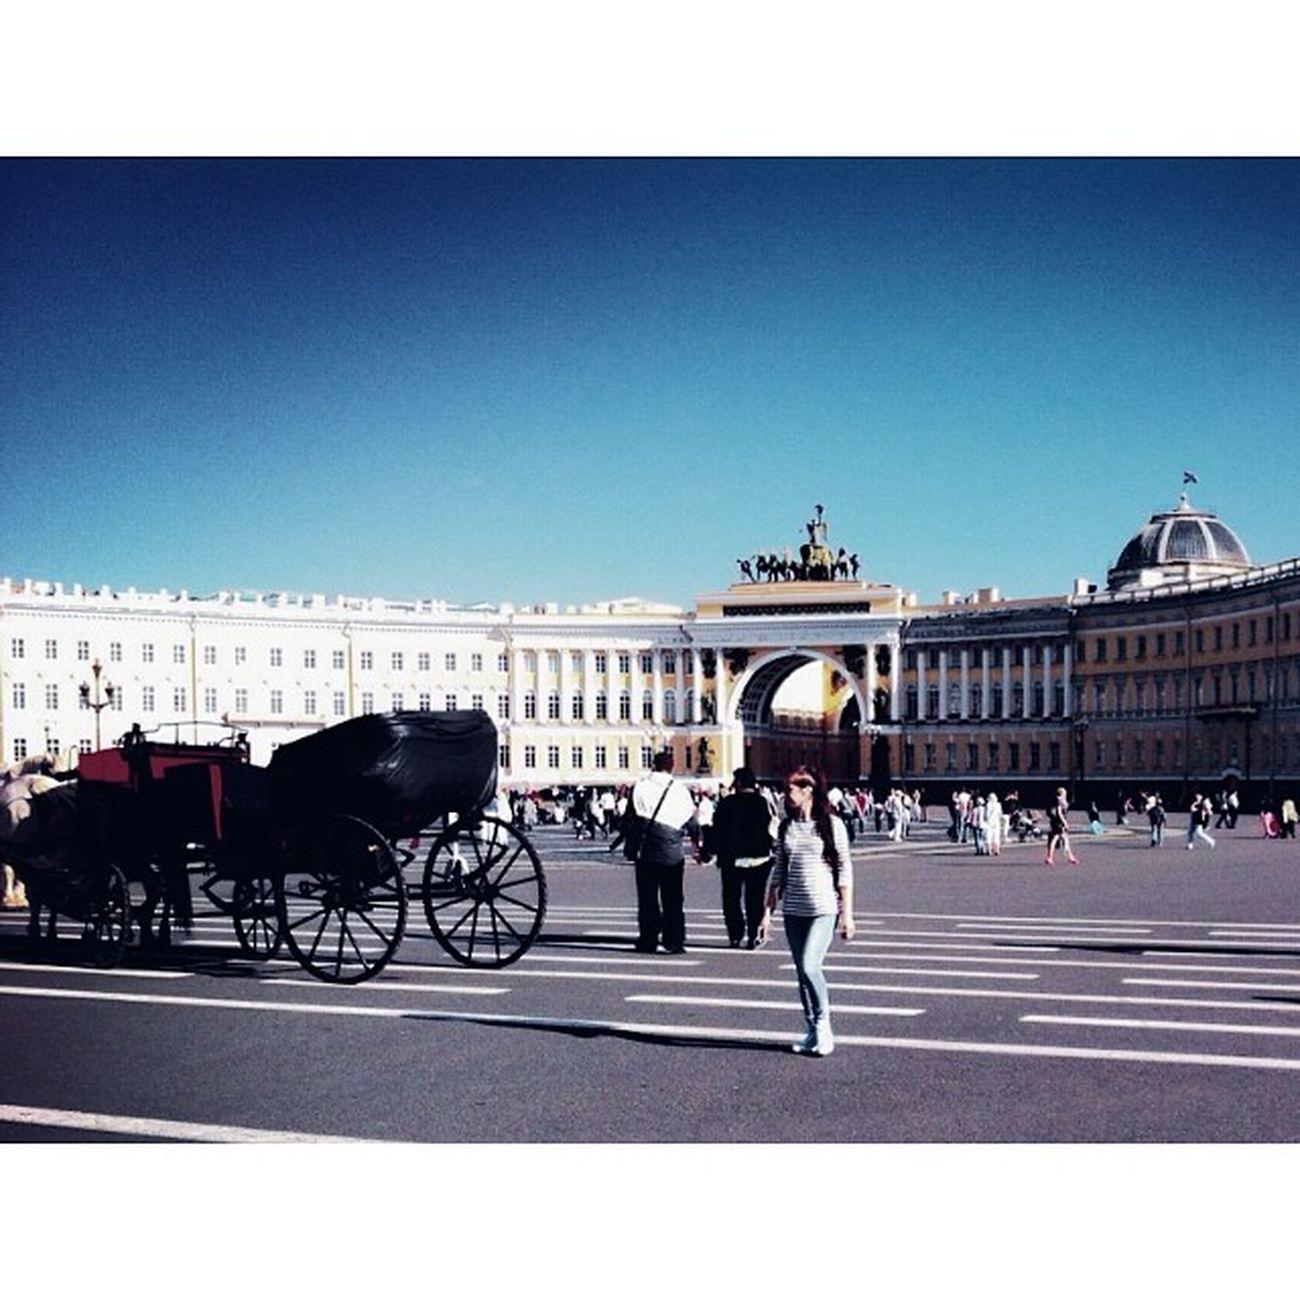 дворцоваяплощадь СанктПетербург петербург Питер спб площадь карета spb piter peterburg leningrad ленинград saintpeterburg